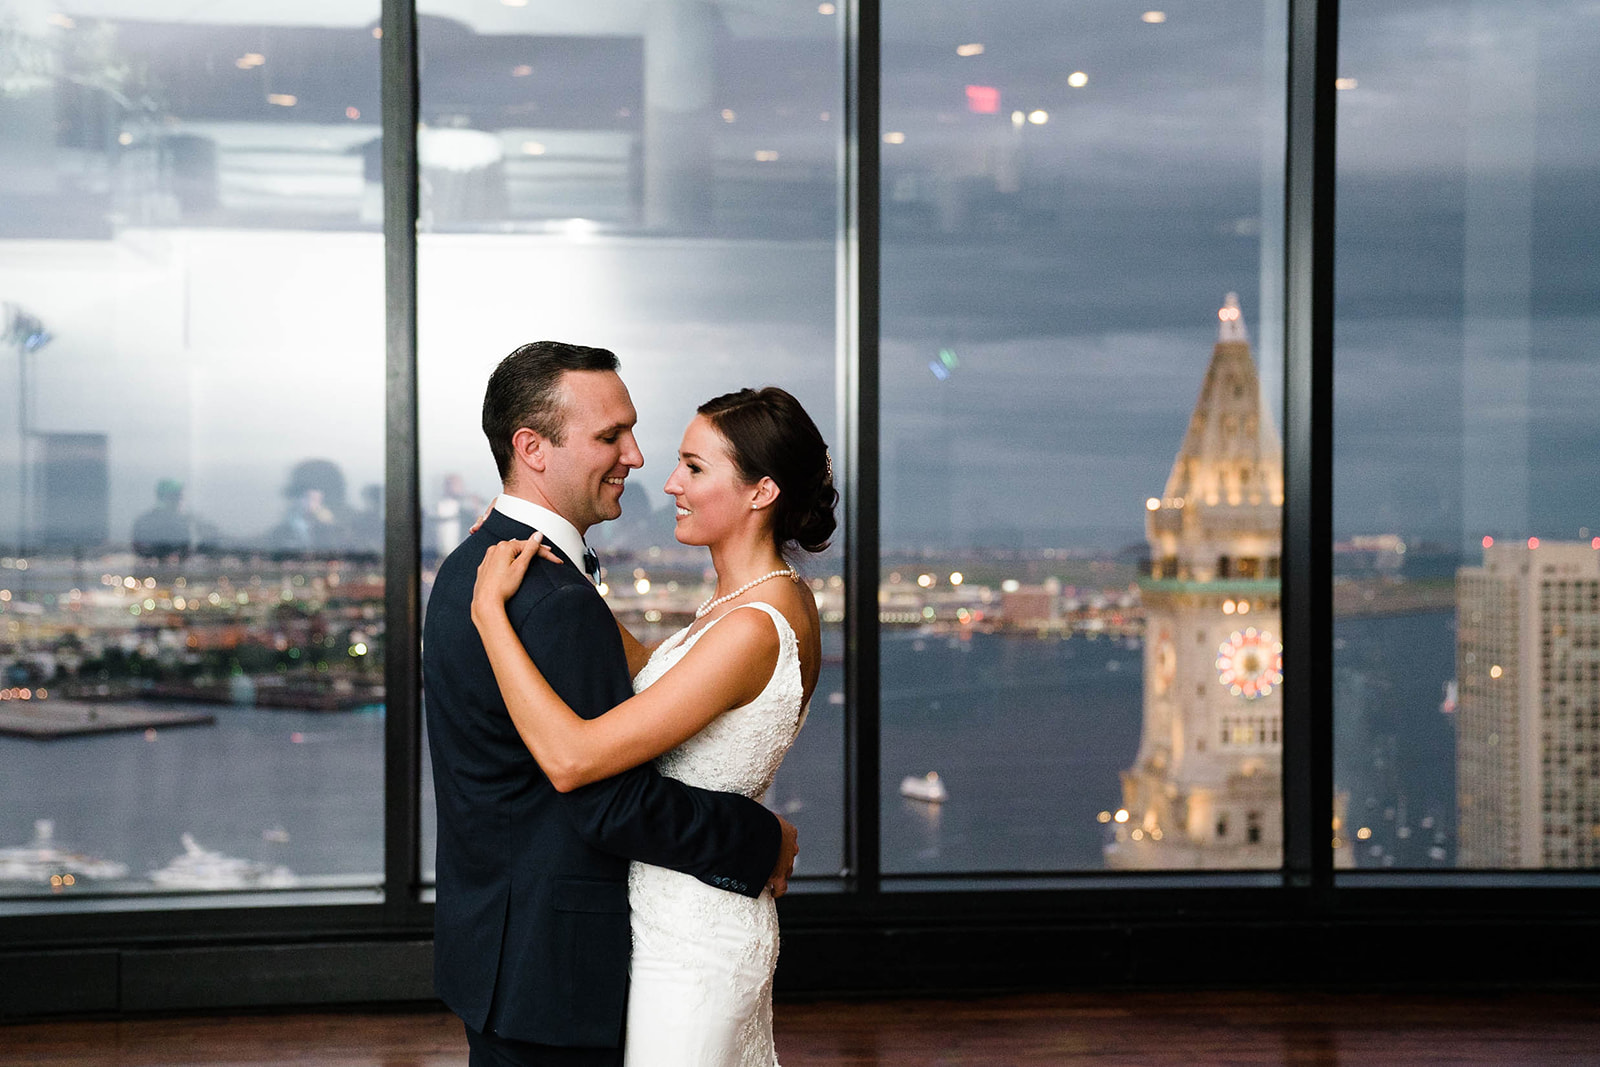 wedding-flowers-state-room-boston-lesfleurs (13).jpg